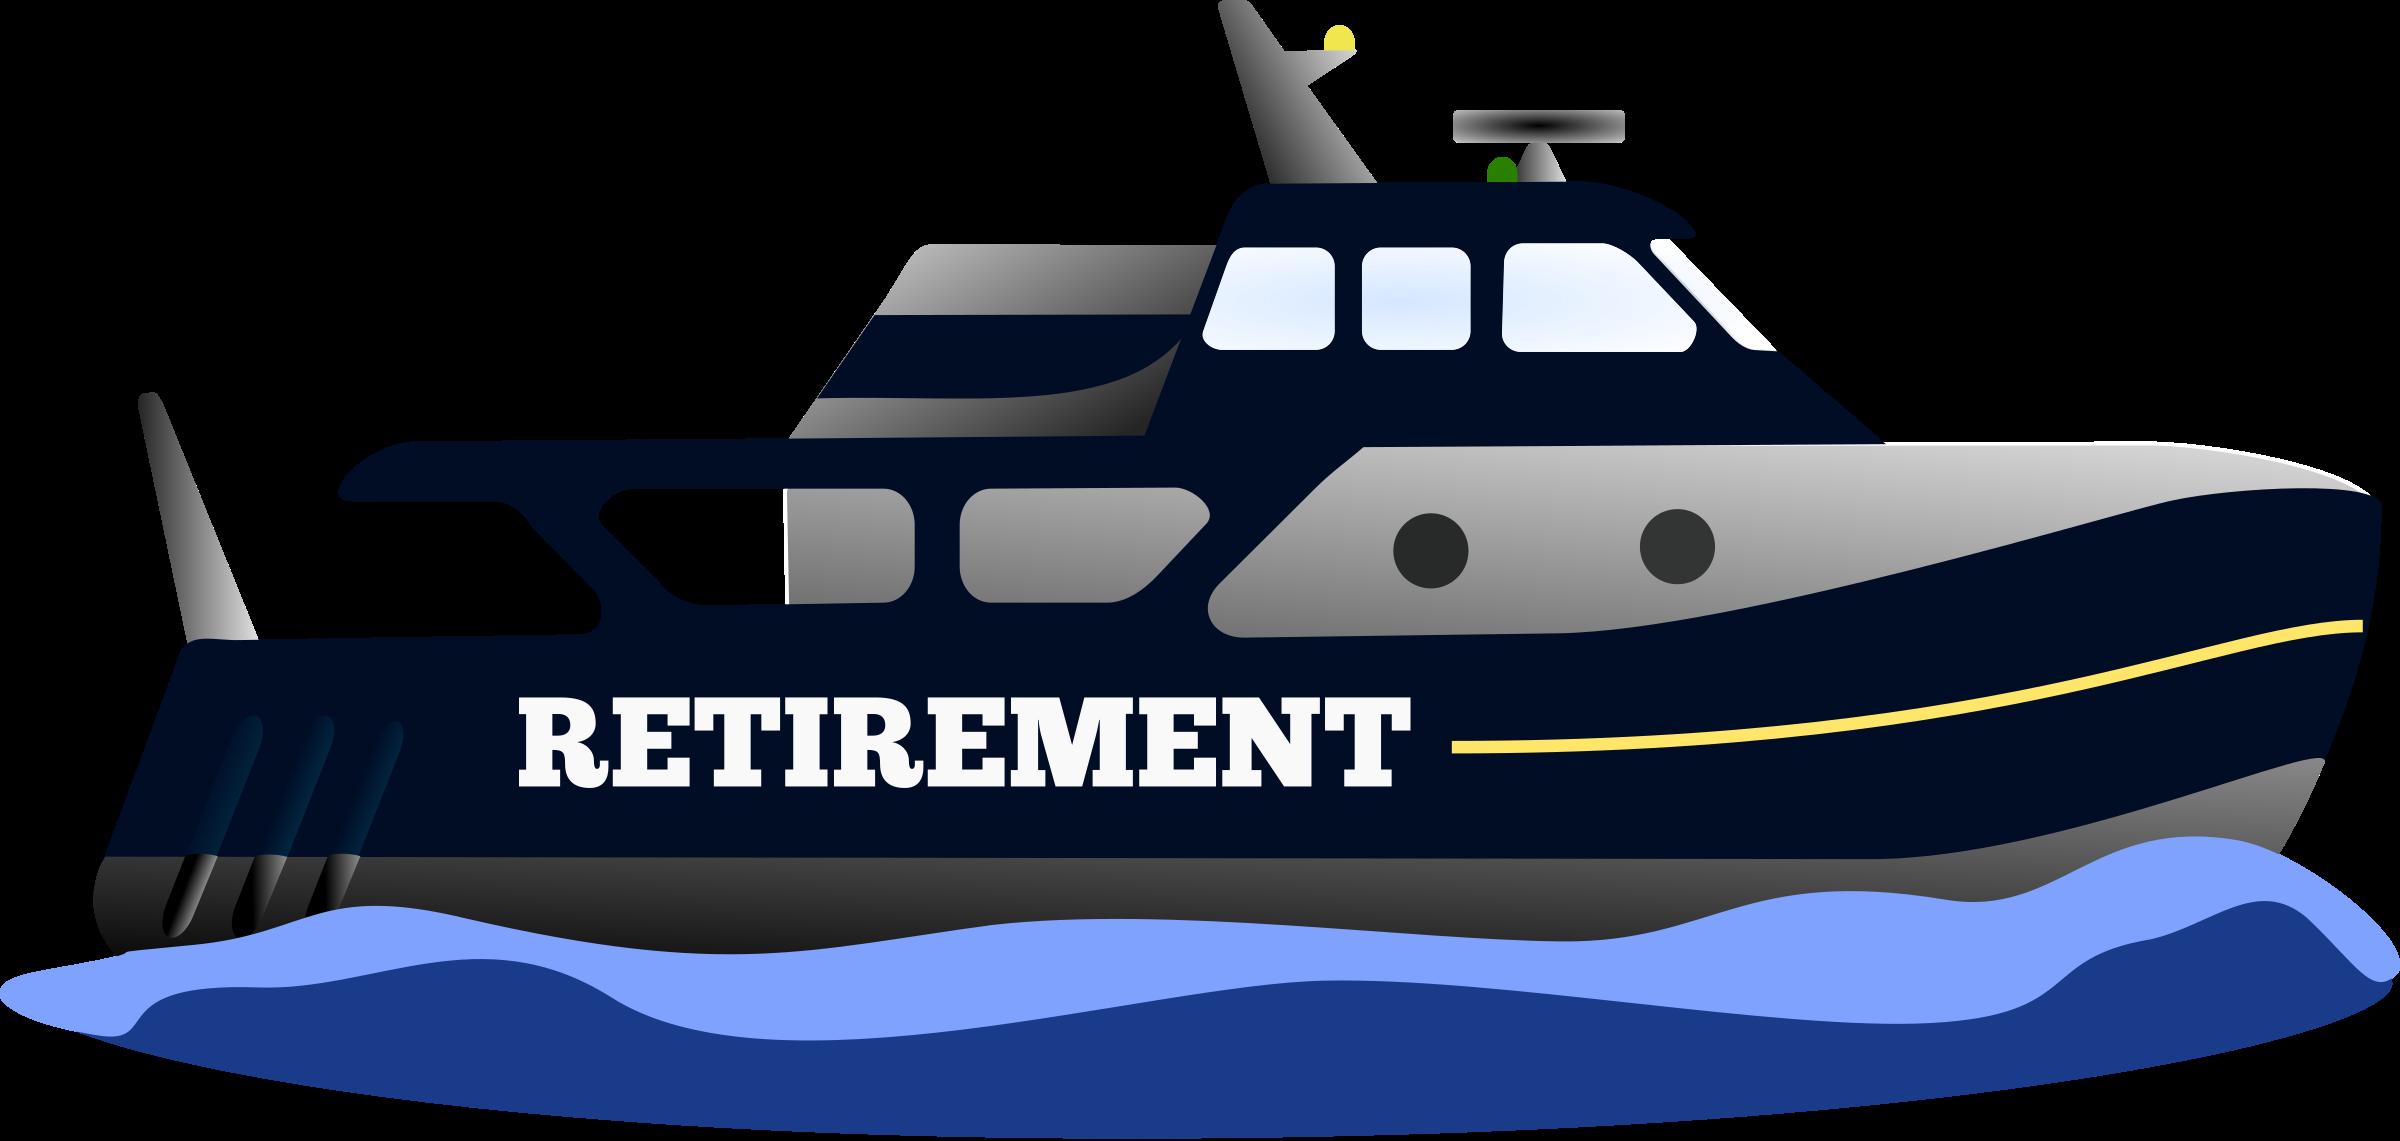 Luggage clipart retirement.  huge freebie download